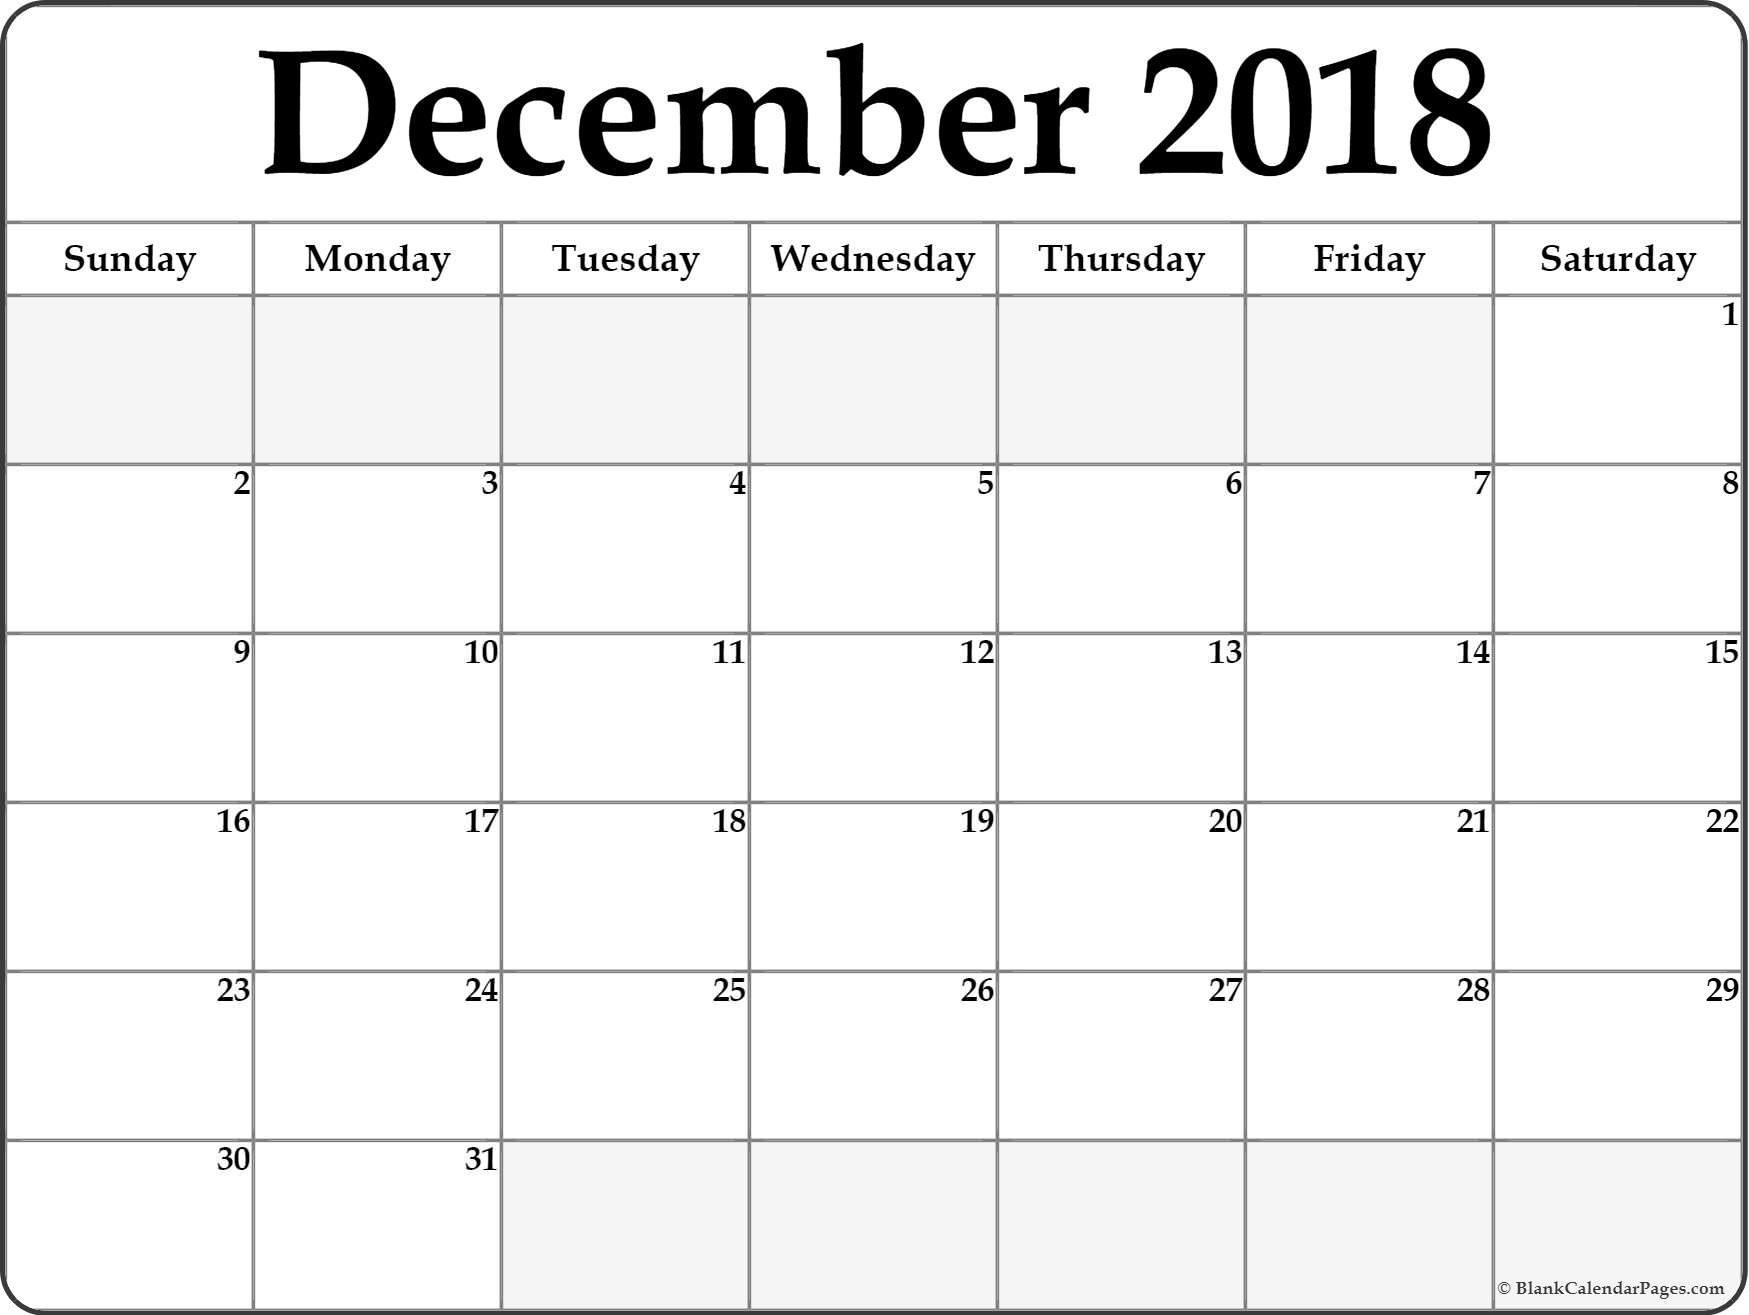 December 2018 Blank Calendar . December 2018 Calendar Printable with regard to Blank Dec Calendar Pages